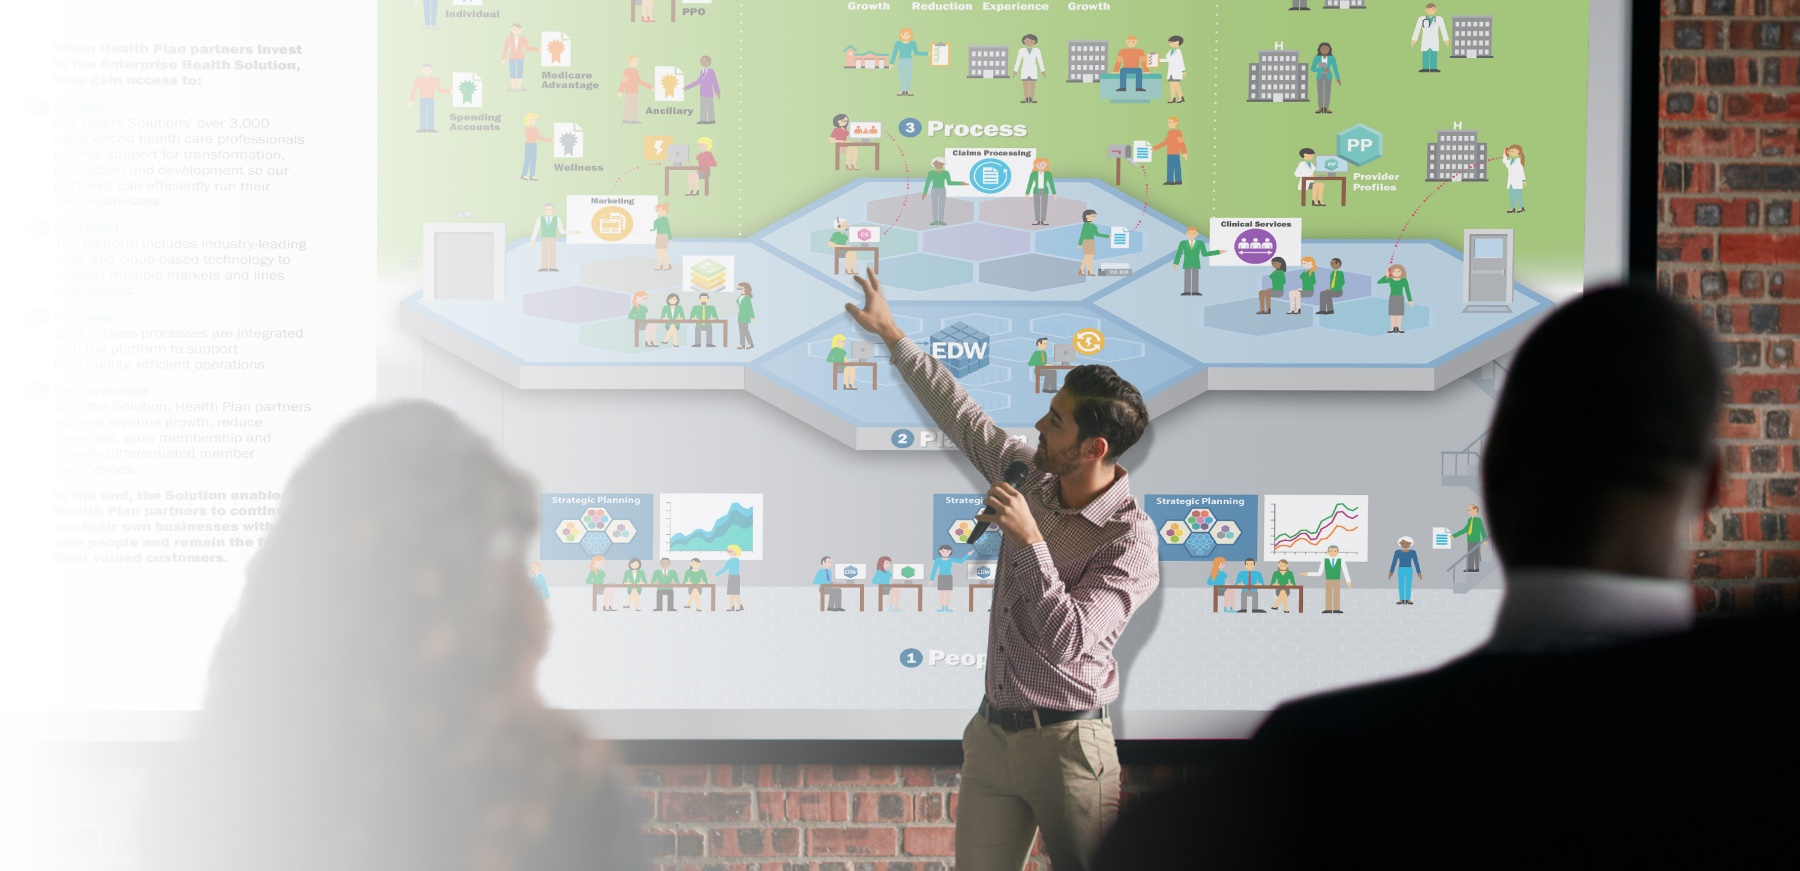 Build a market-shifting business model